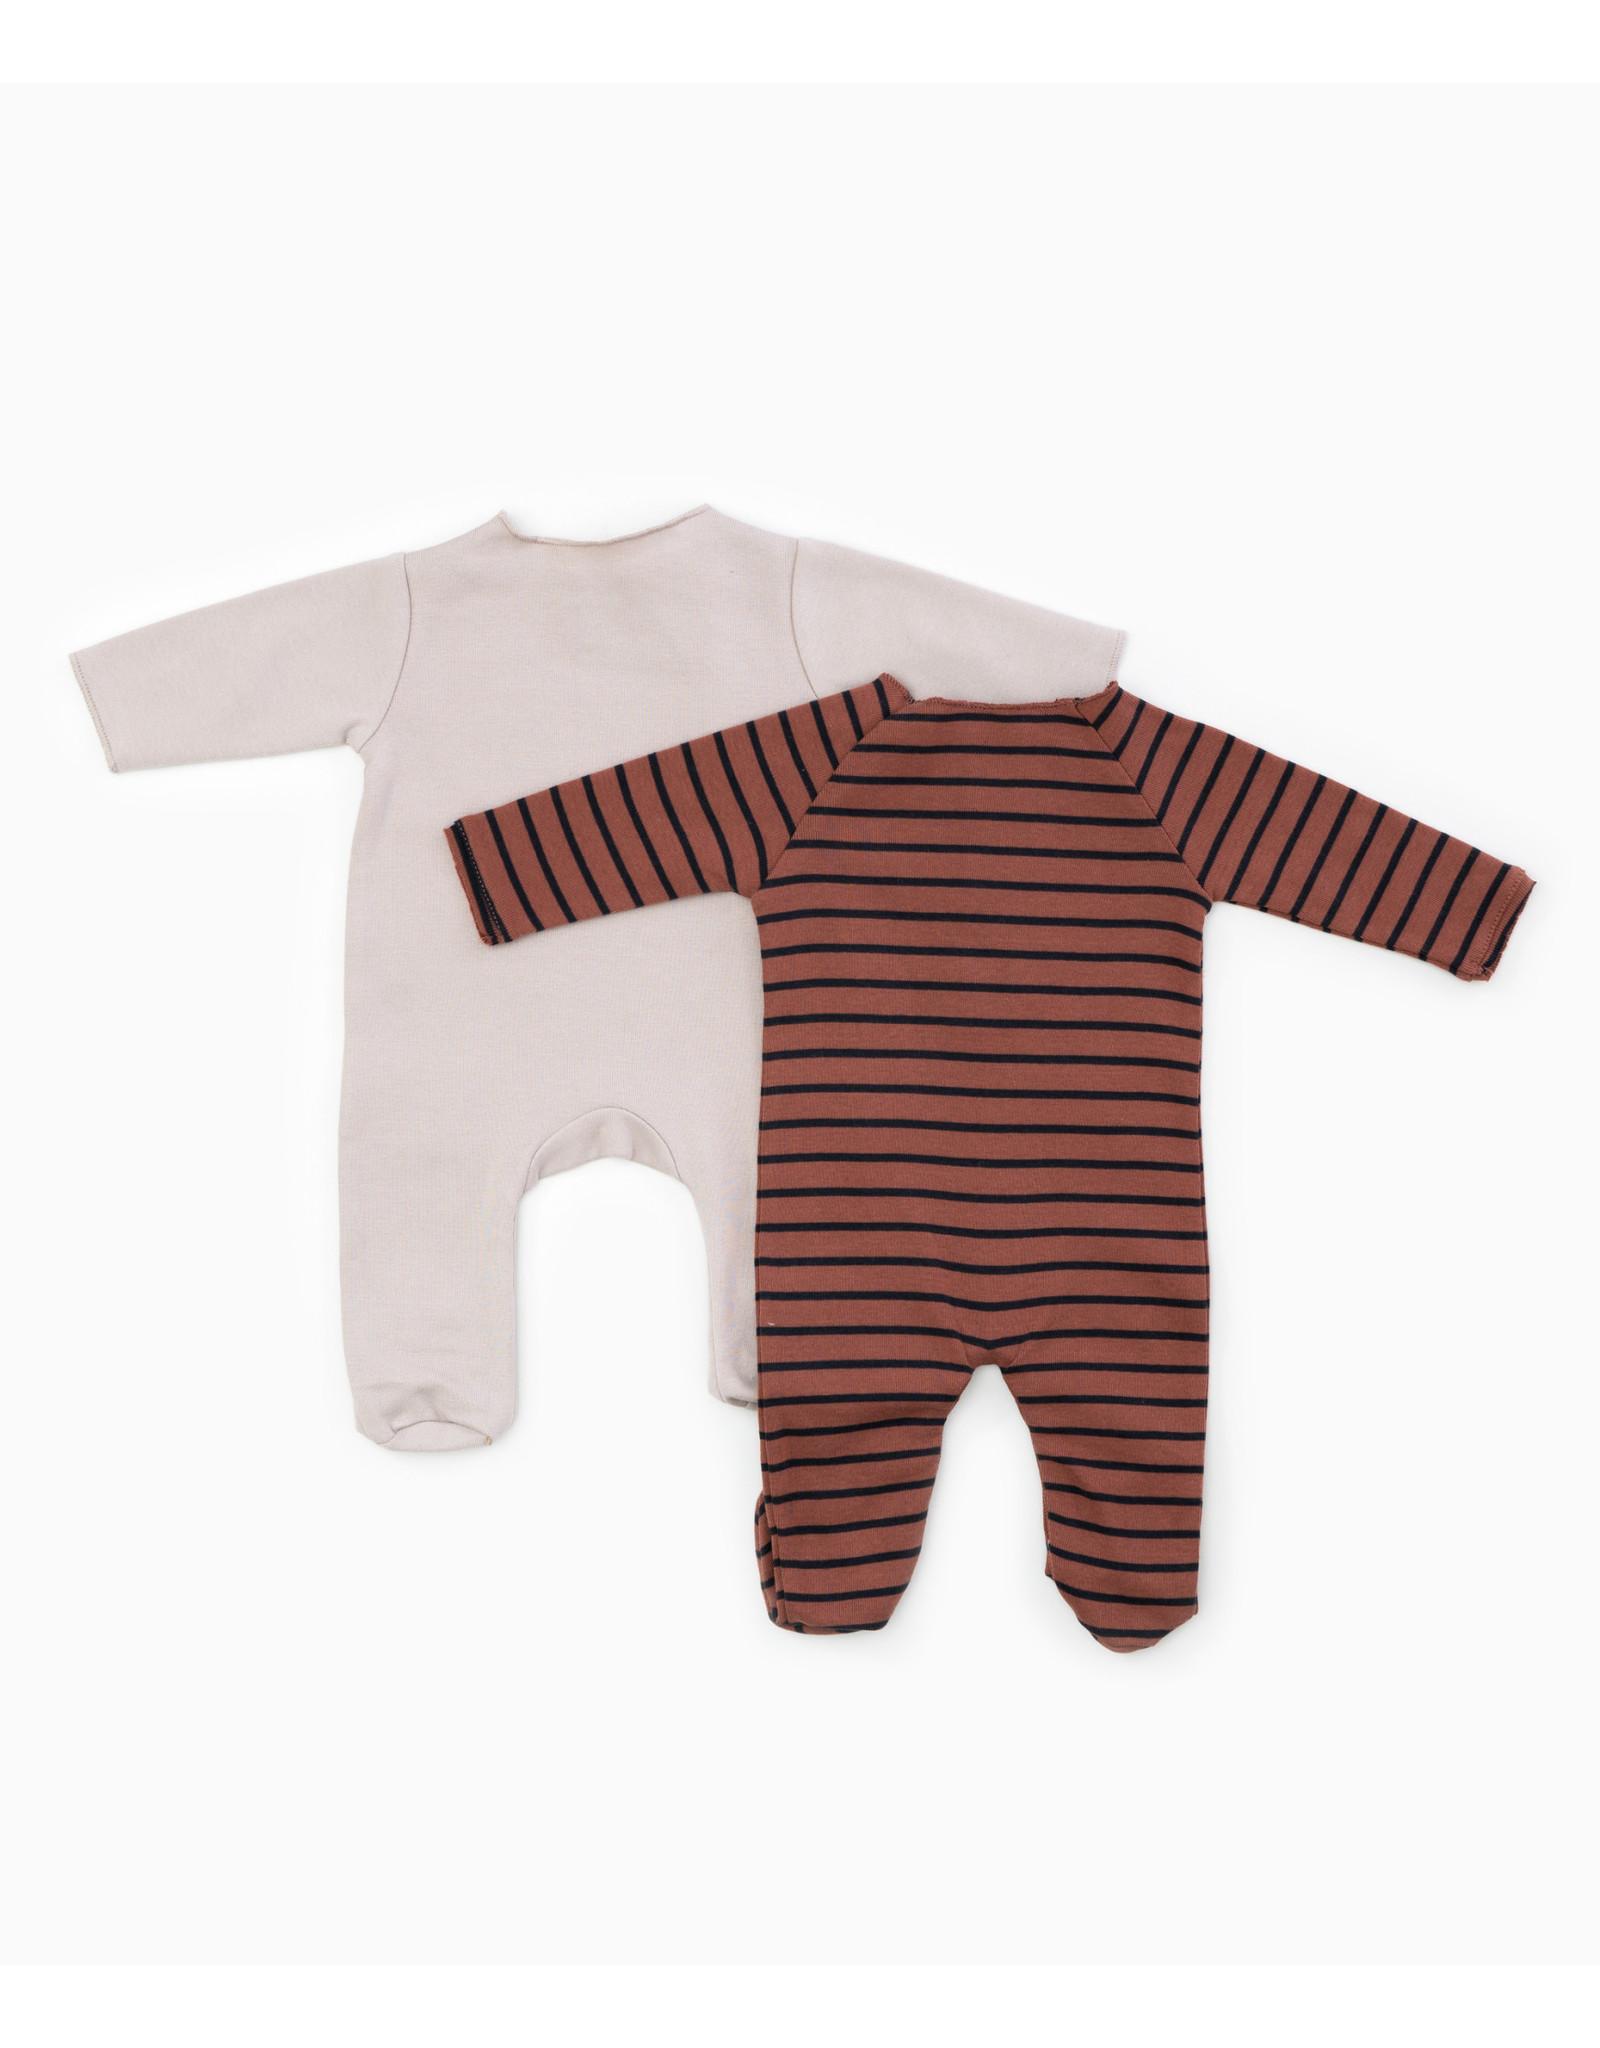 Play Up Striped Rib Babygrow romper